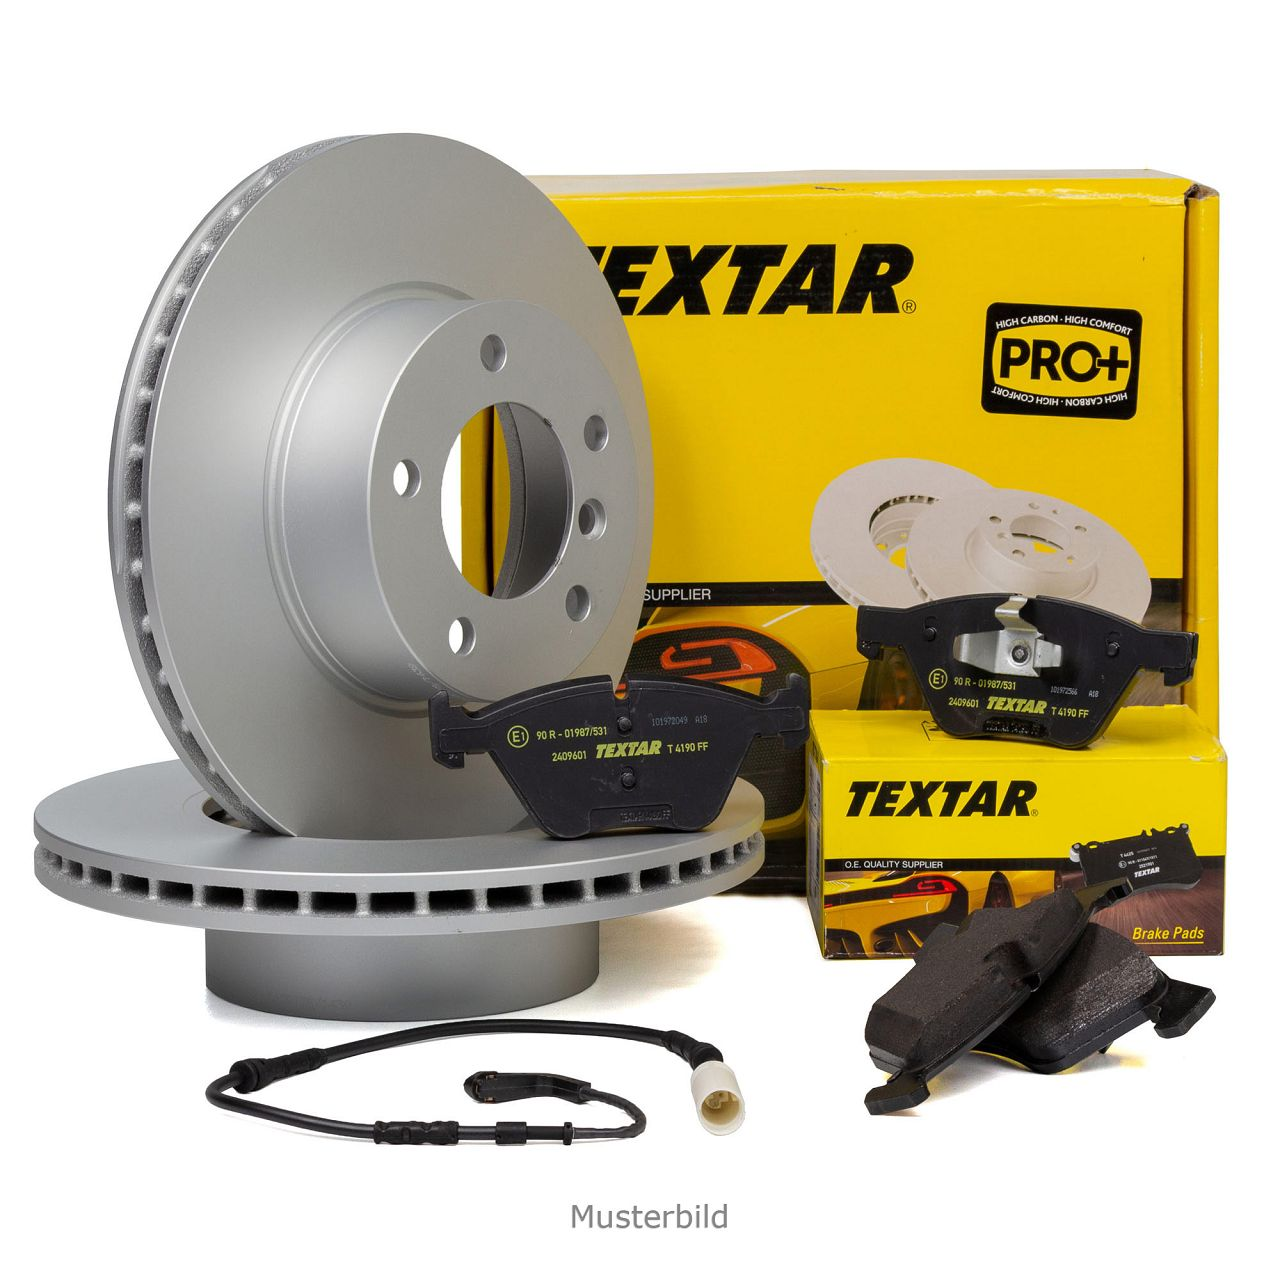 TEXTAR Bremsscheiben + Beläge + Wako MERCEDES C-Klasse W204 E-Klasse W212 SLK R172 vorne